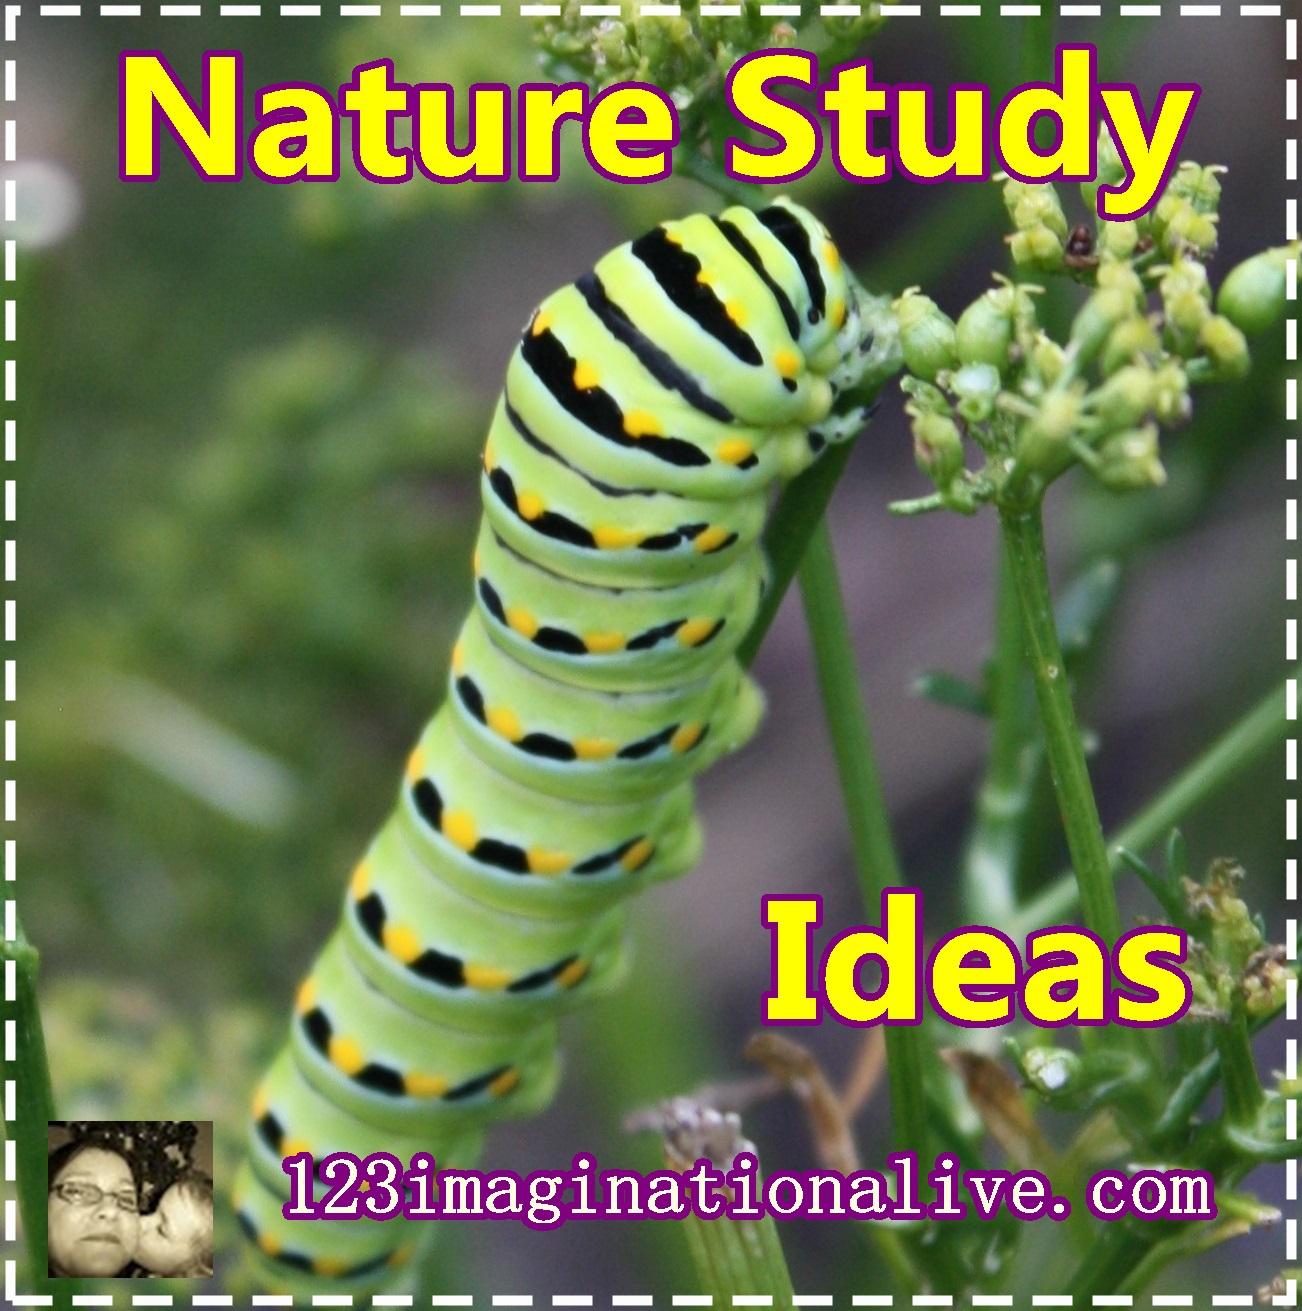 Nature Study Ideas